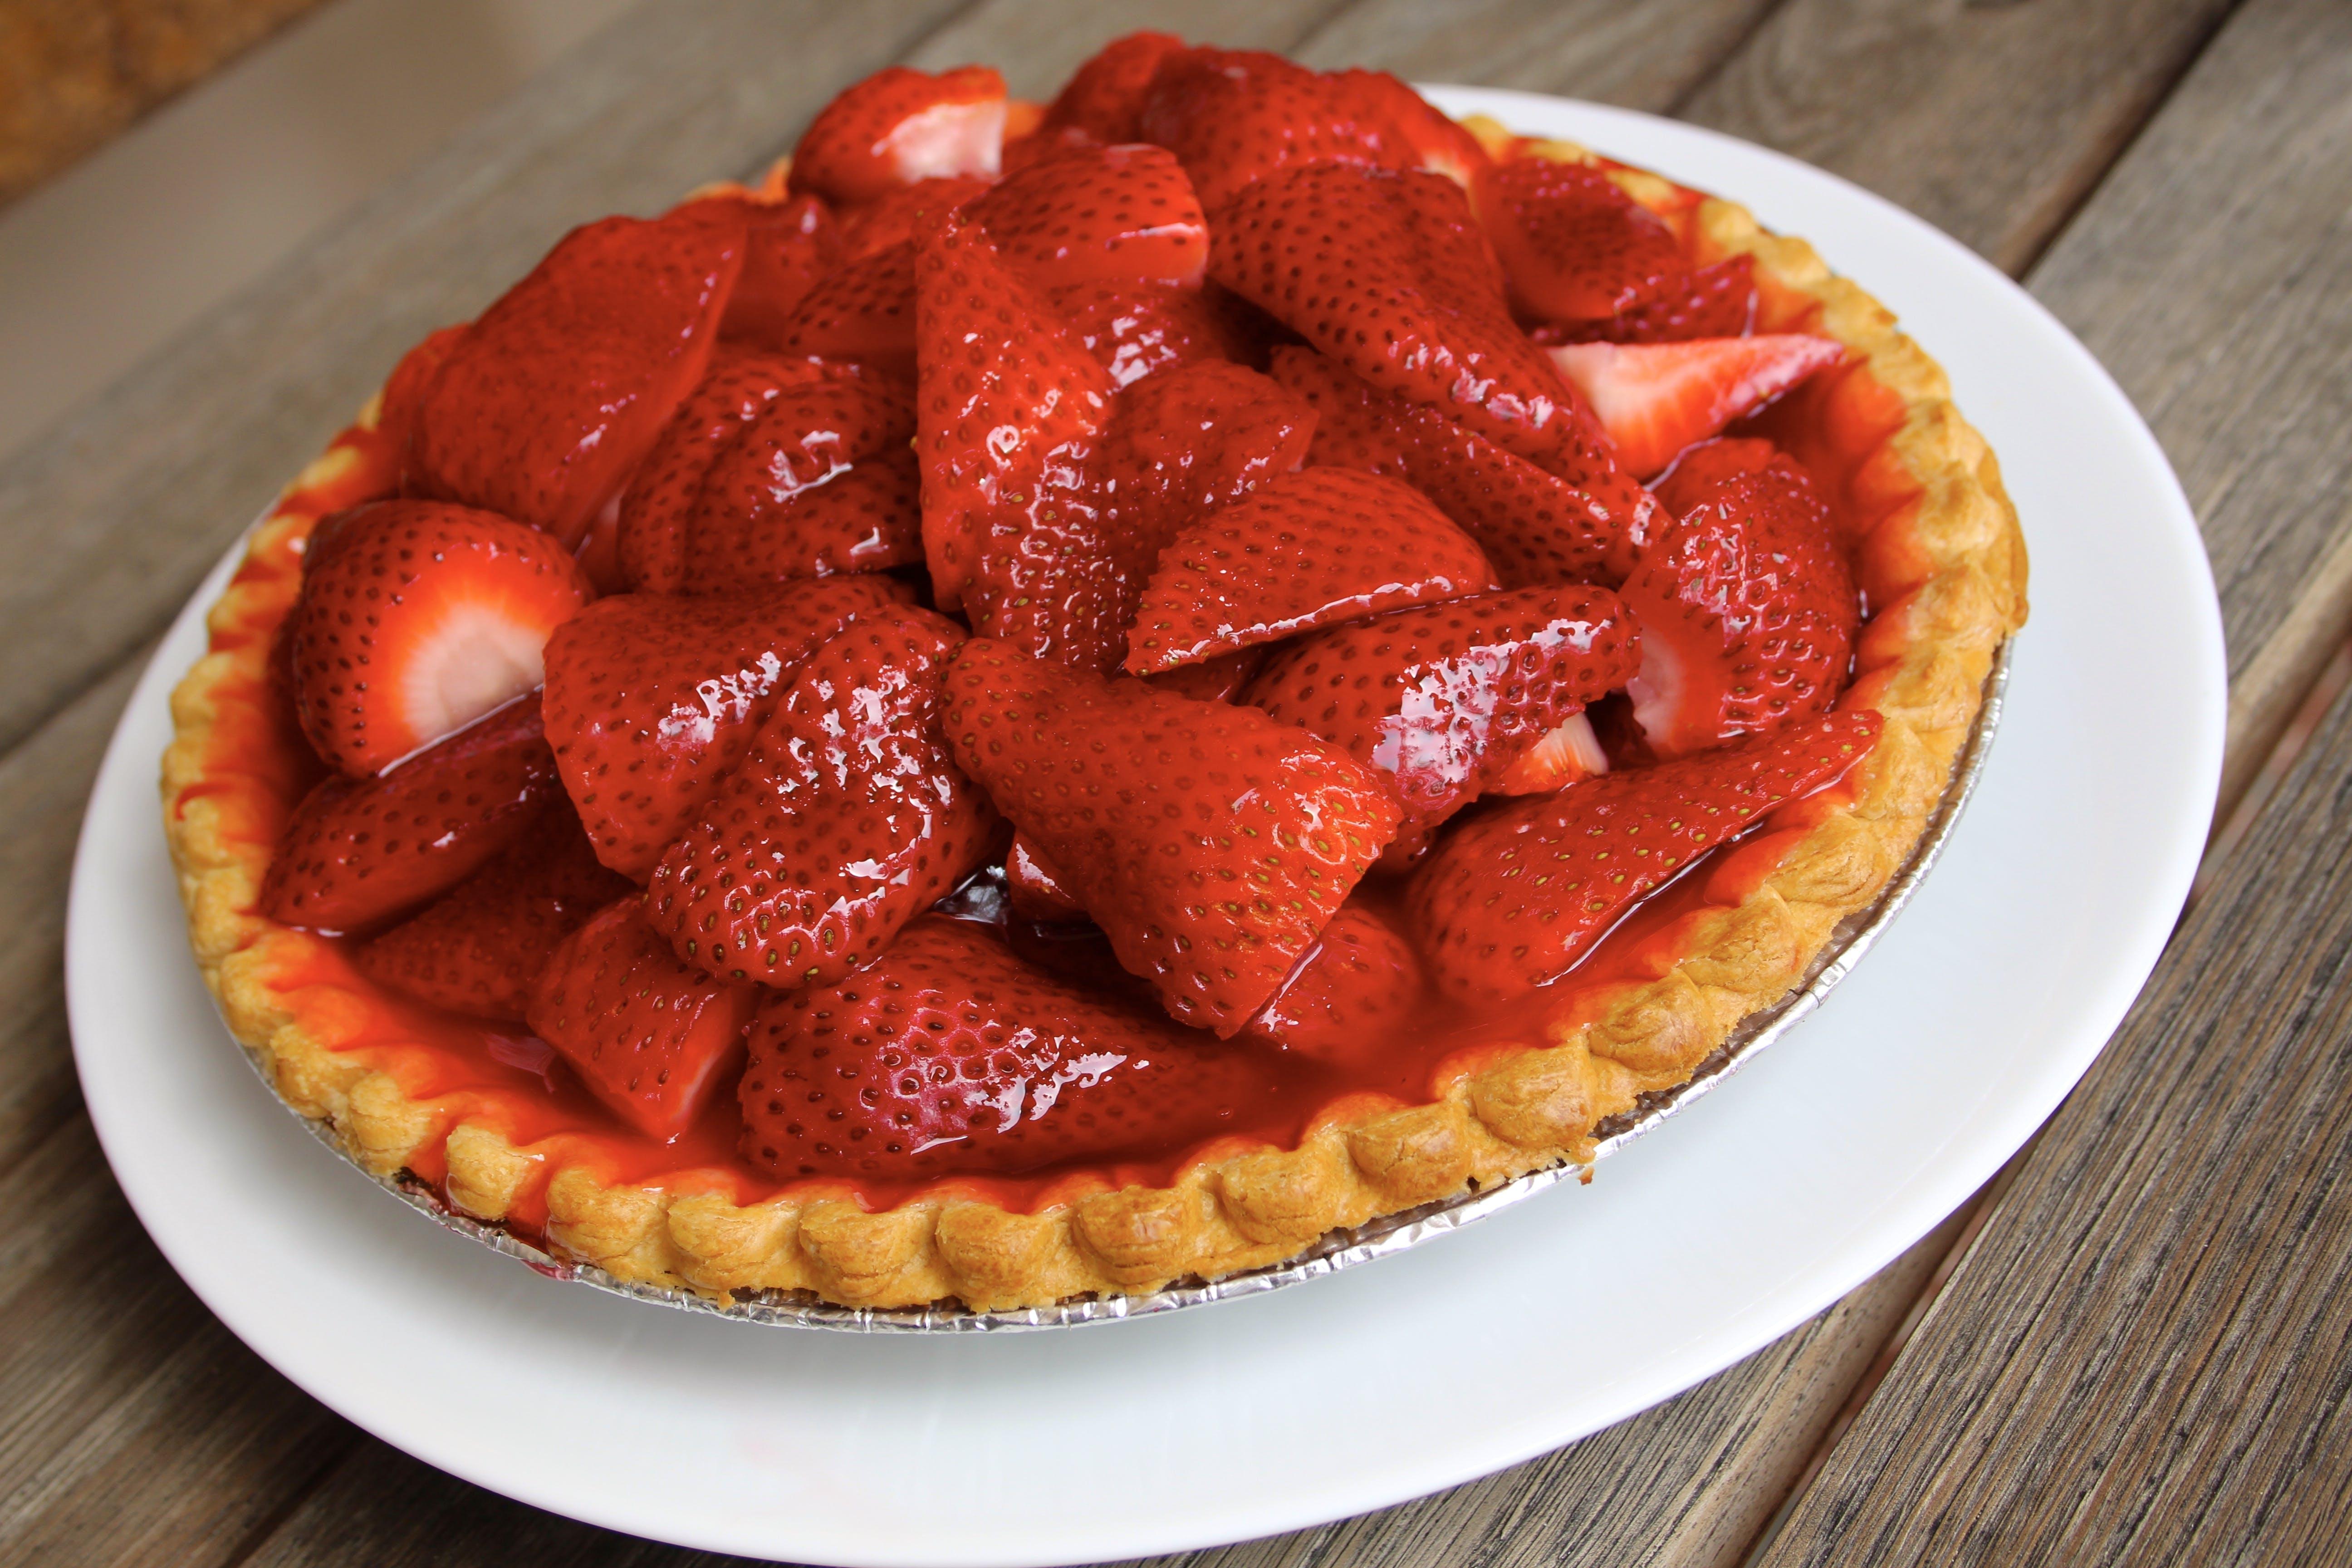 Strawberry Pie On White Plate